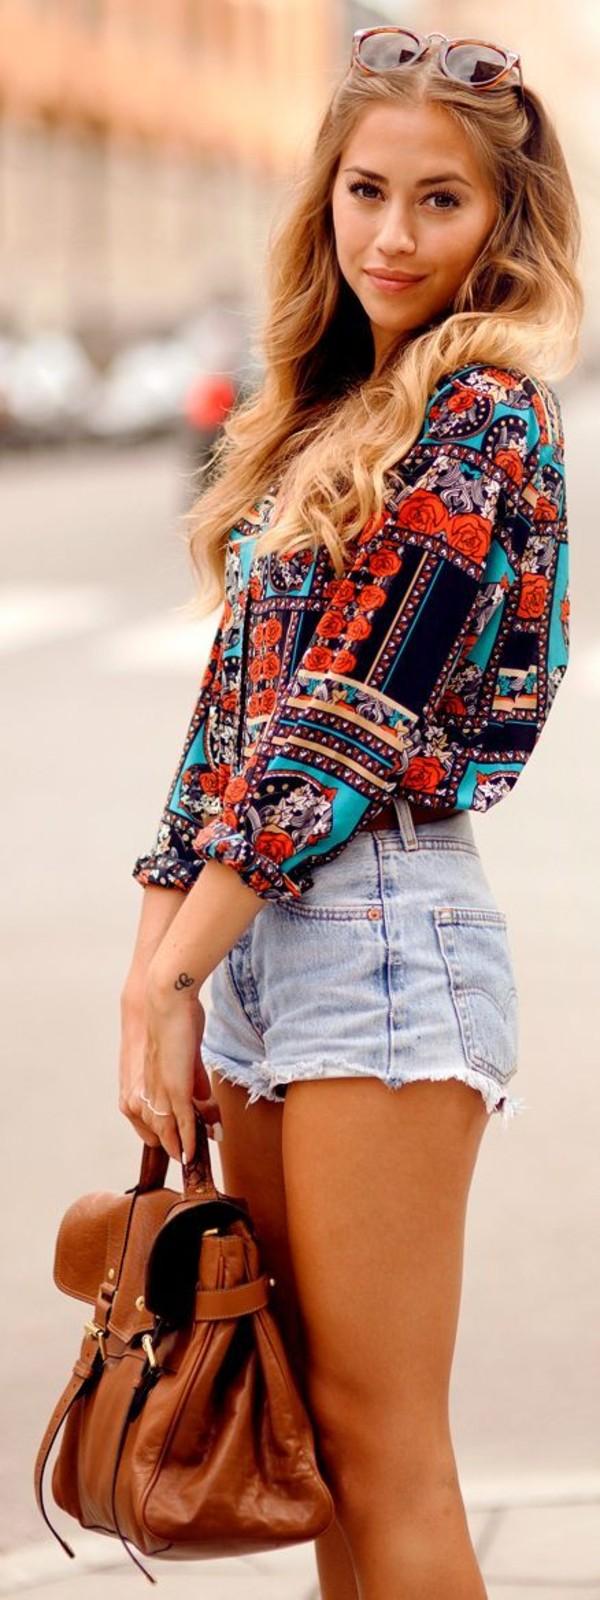 bag fashion bags blouse shirt shorts floral shirt colorful